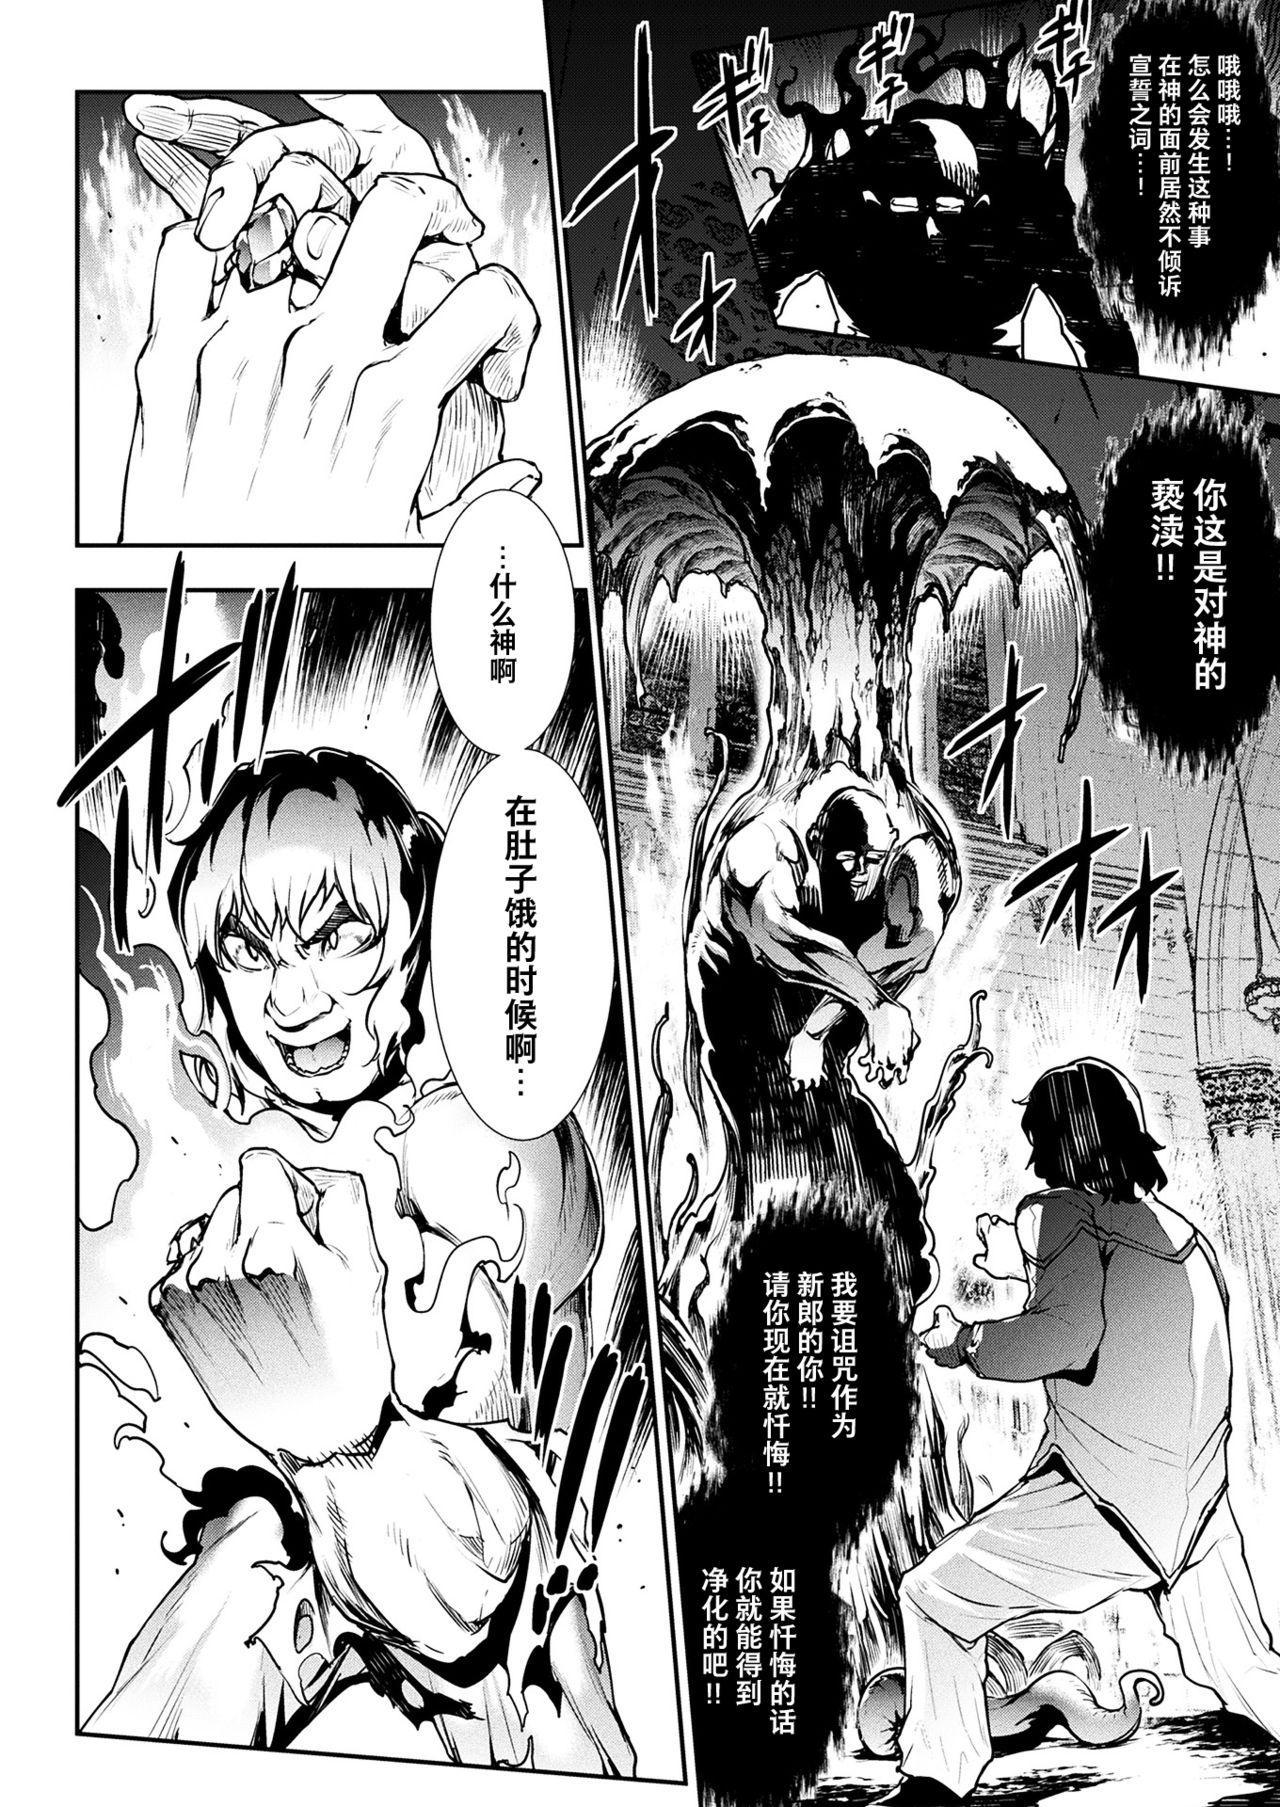 [Erect Sawaru] Raikou Shinki Igis Magia -PANDRA saga 3rd ignition- Ch. 24 (COMIC Unreal 2020-08 Vol. 86) [Chinese] [不咕鸟汉化组] [Digital] 23